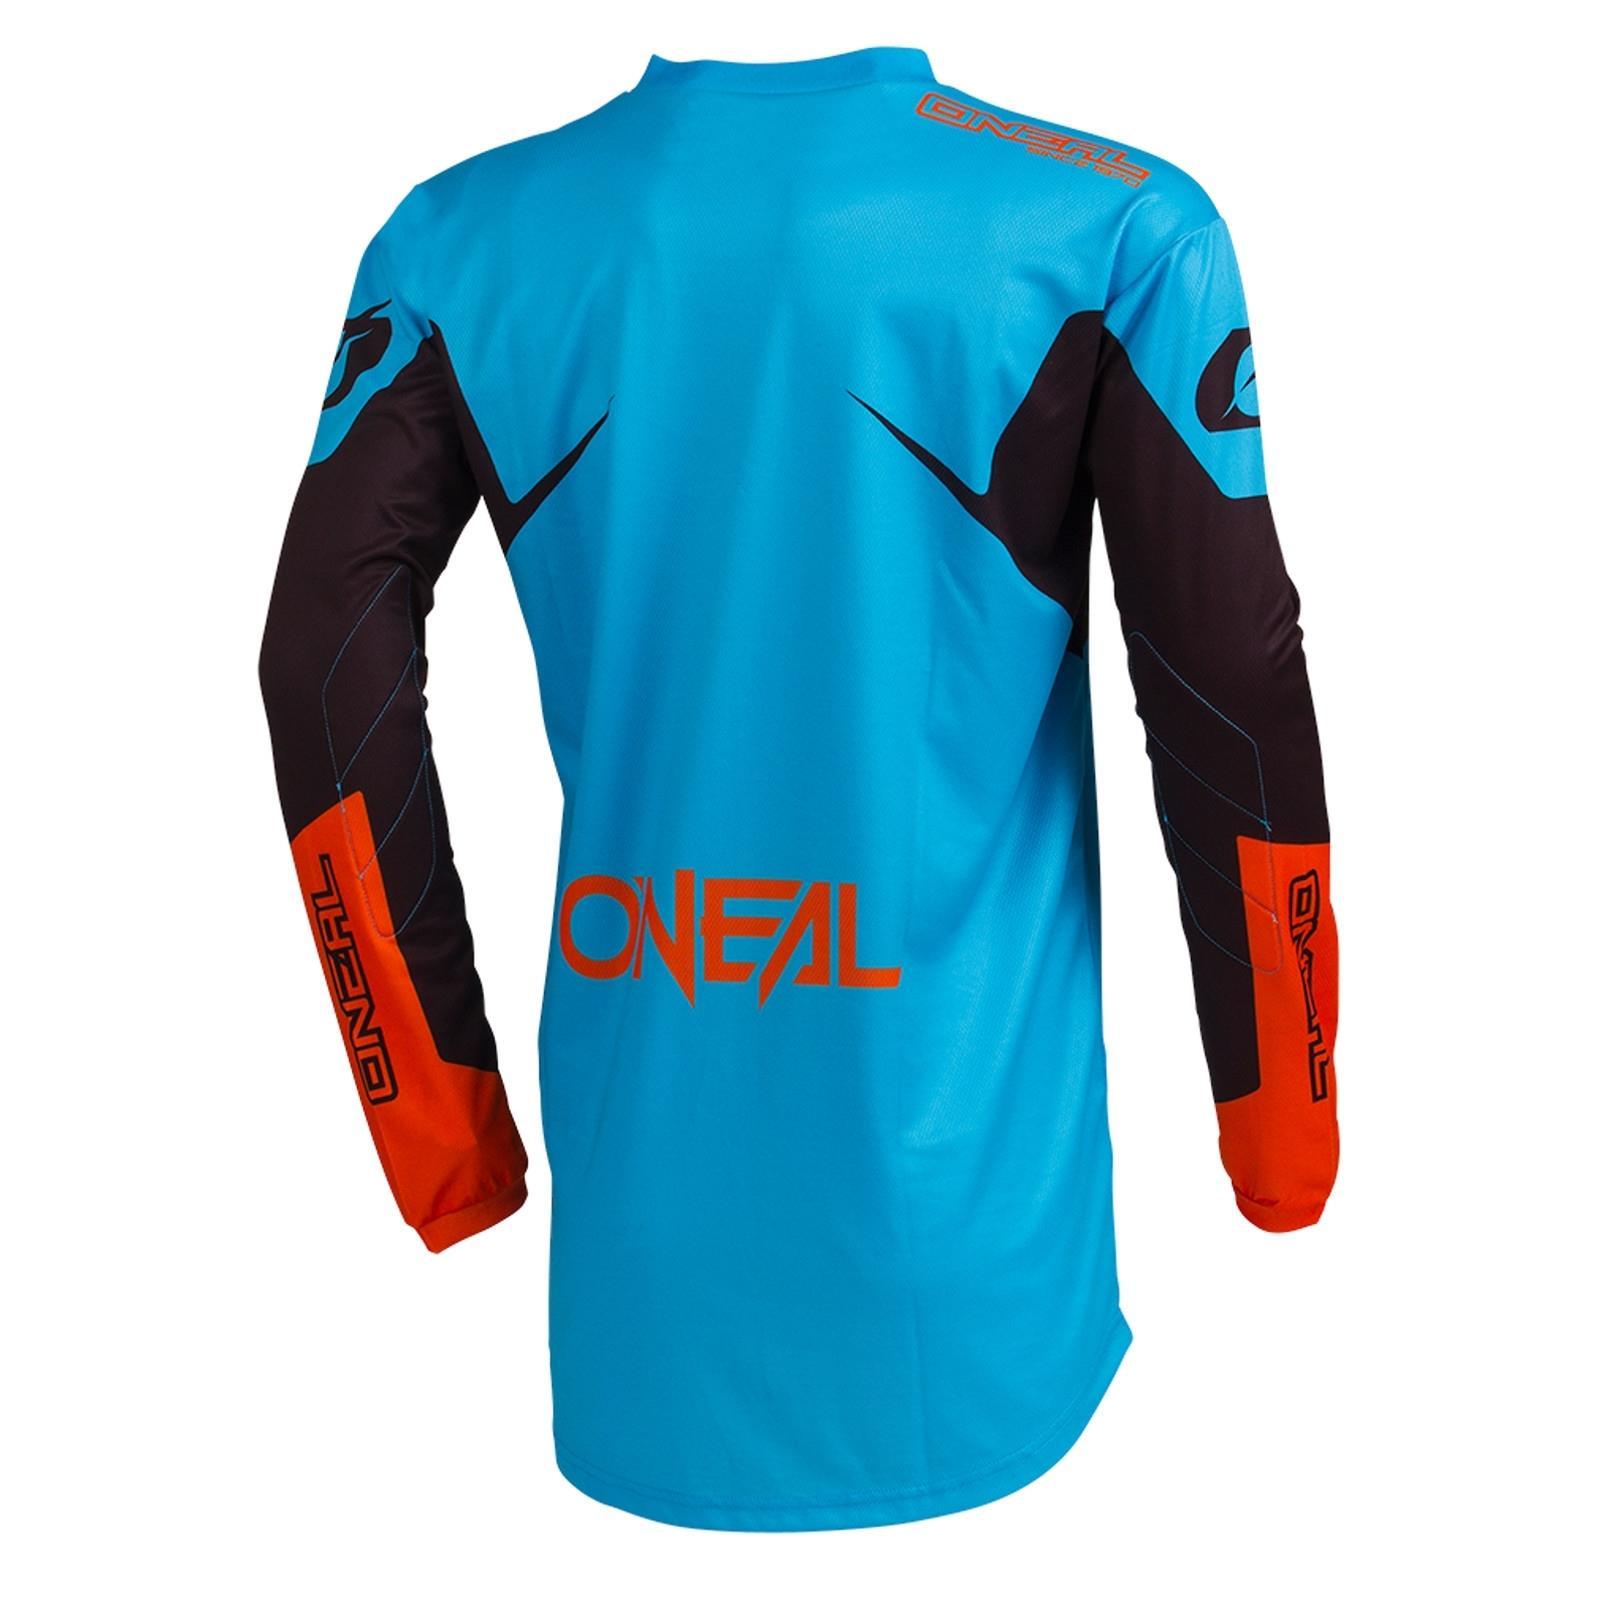 O-039-Neal-Element-Racewear-MOTOCROSS-JERSEY-MX-ENDURO-CROSS-MAGLIA-MOUNTAIN-BIKE miniatura 9